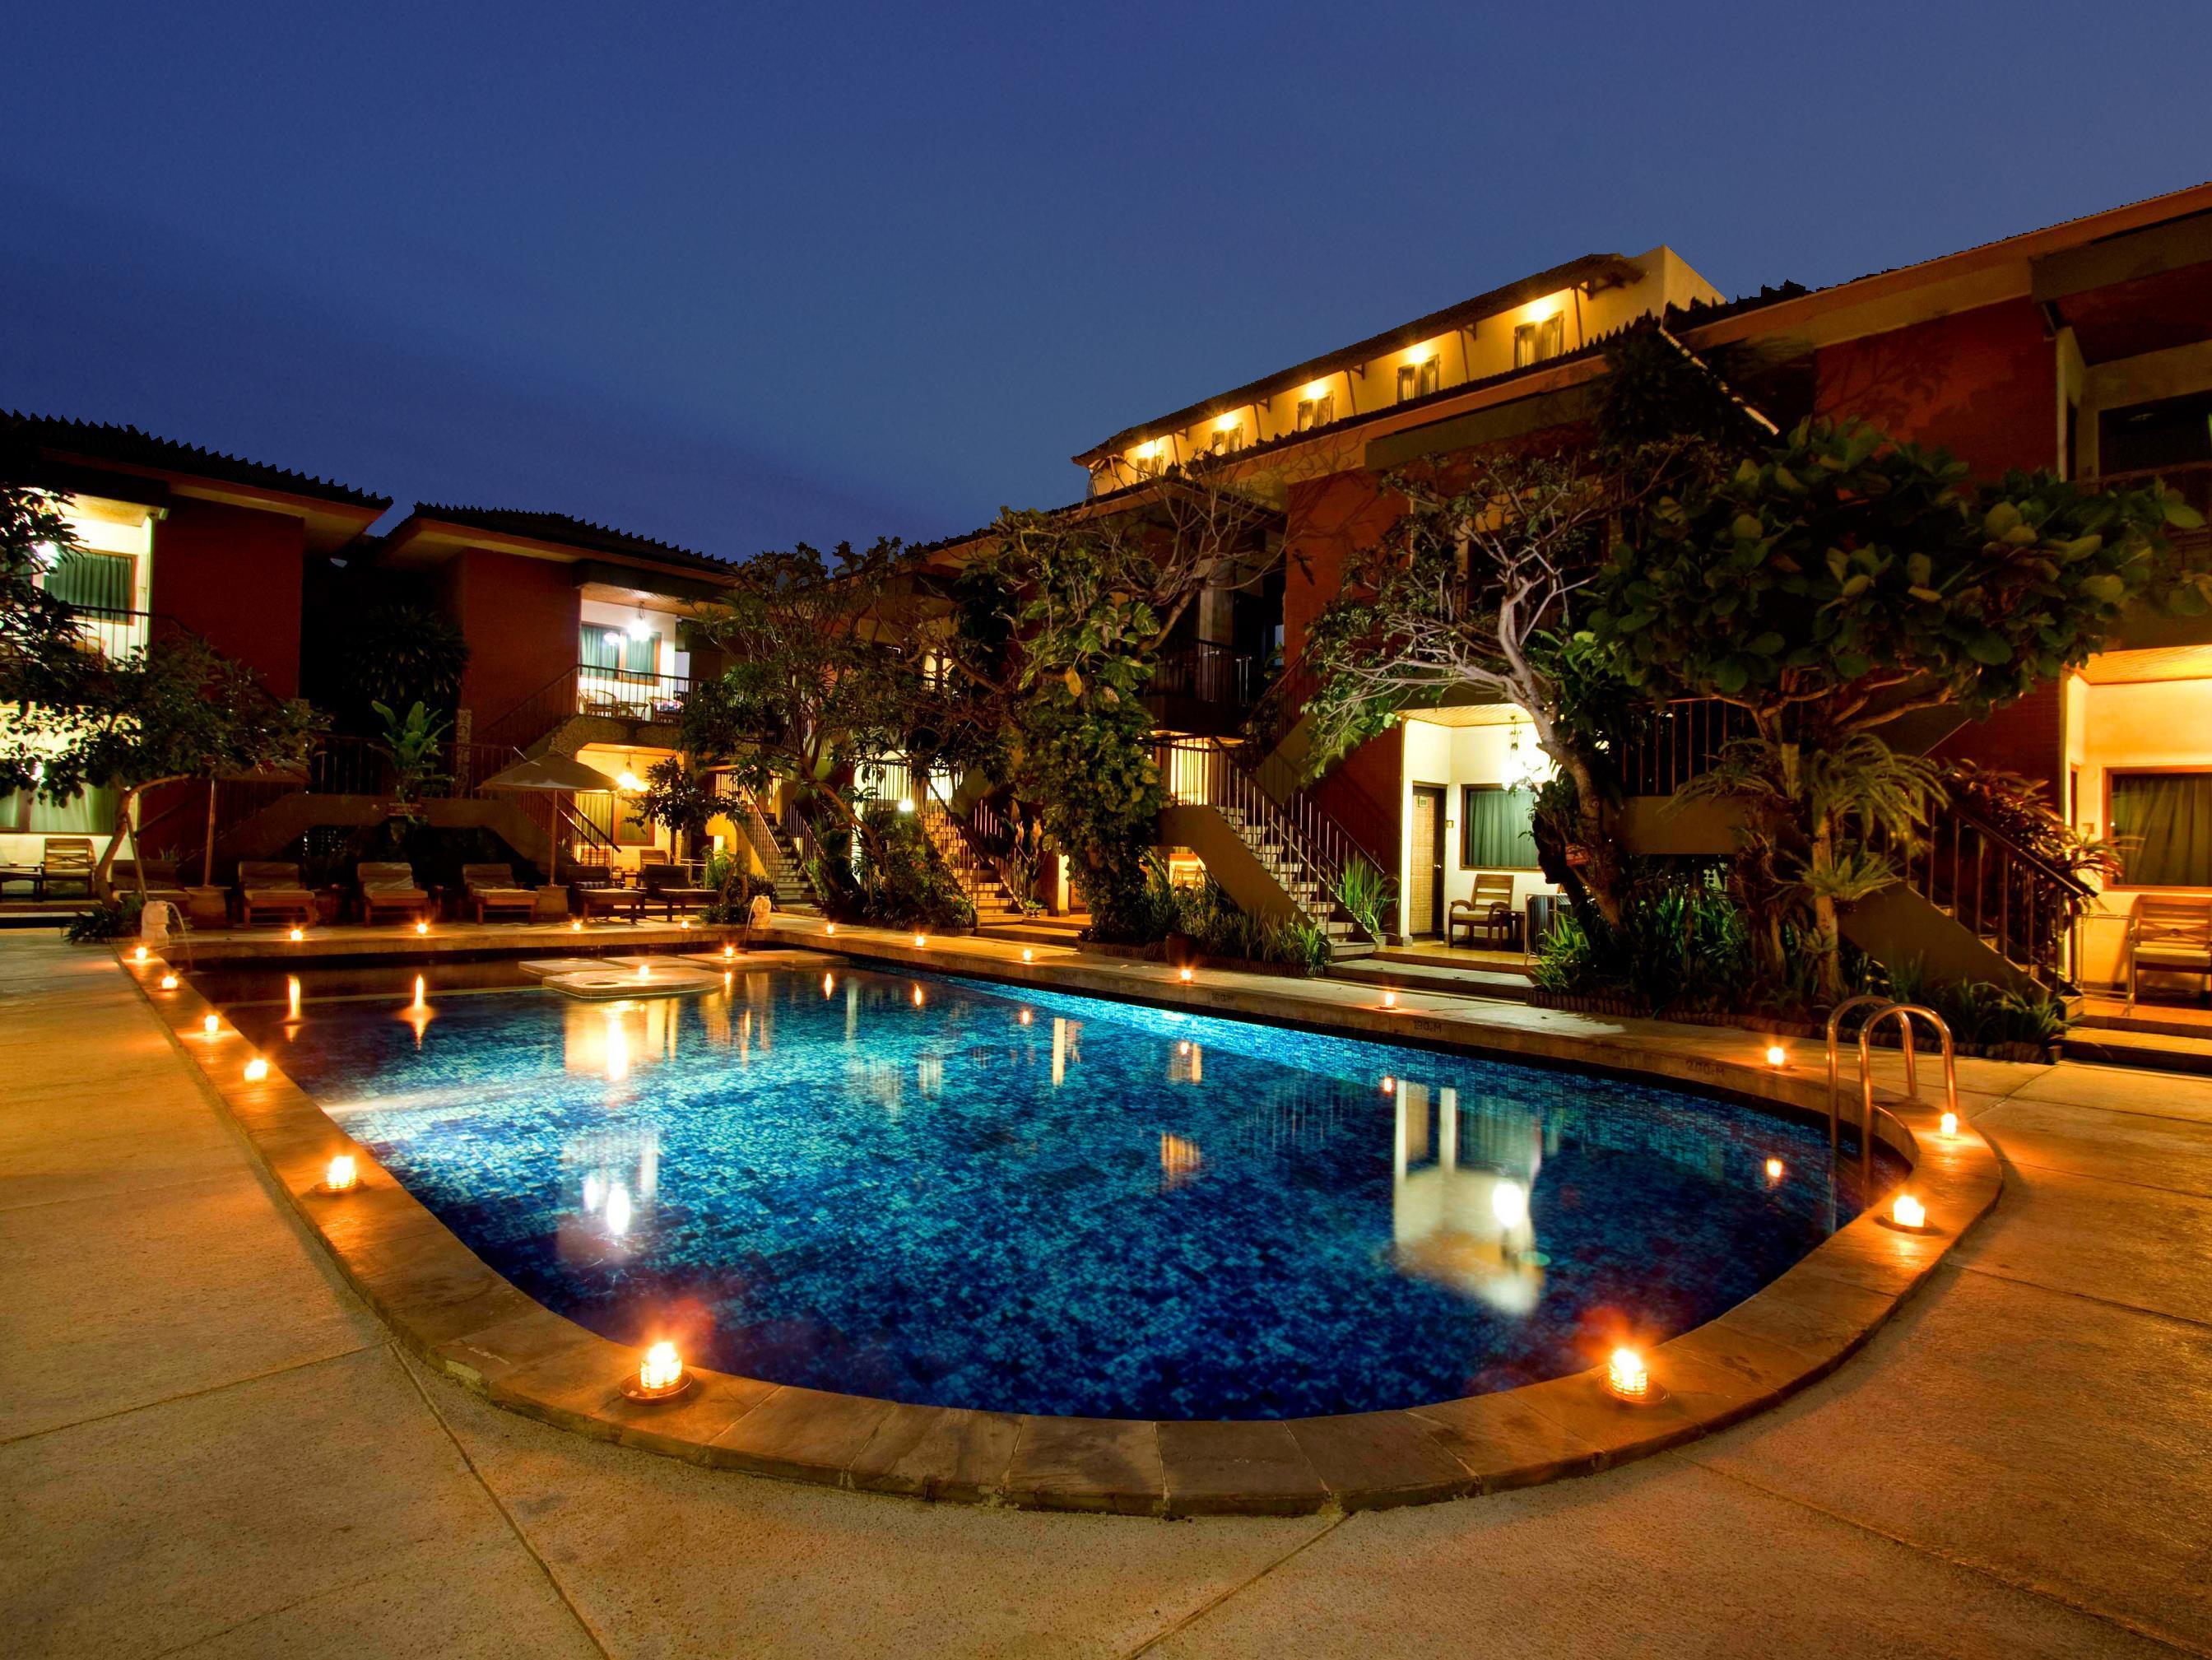 Rama Garden Hotel Bali ホテル詳細